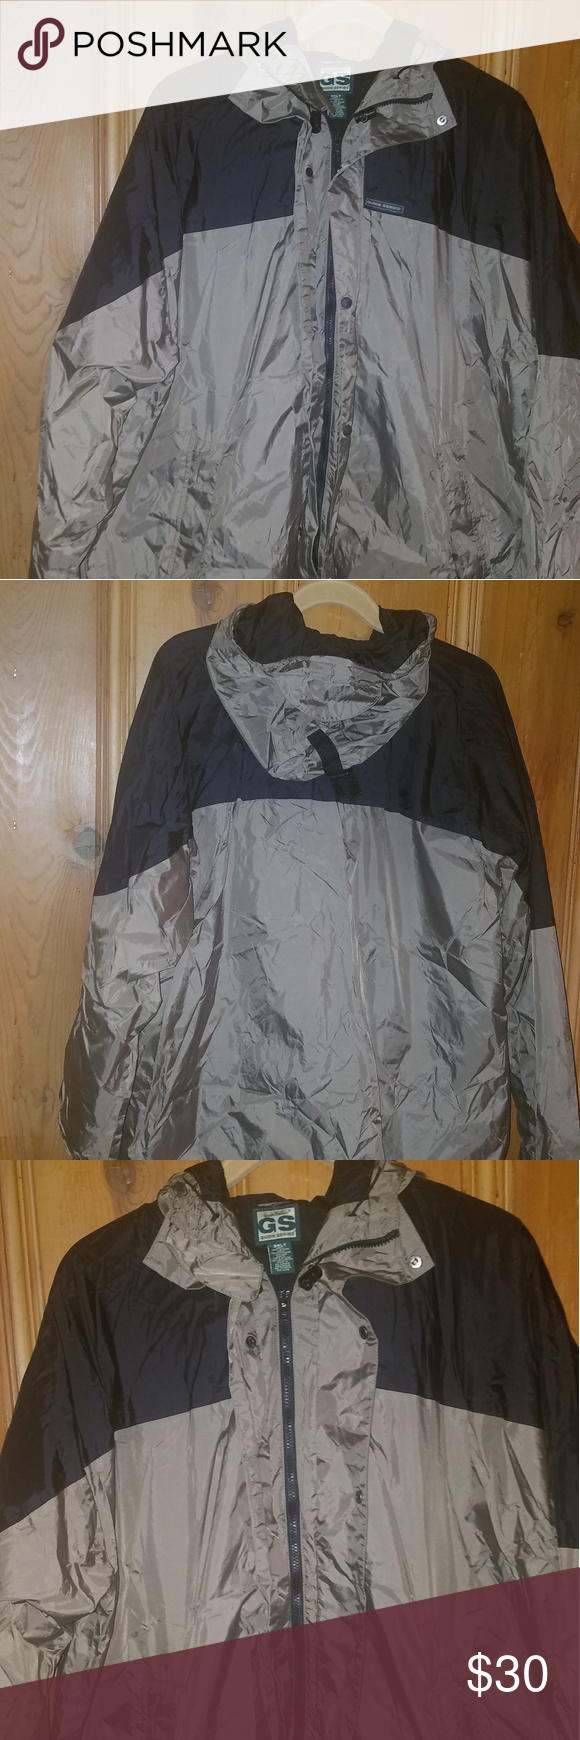 d0a0ec9c448db Guide series waterproof jacket Men's Gander mountain guide series  waterproof zip and snap nylon jacket. 3XLT Guide series Jackets & Coats  Windbreakers